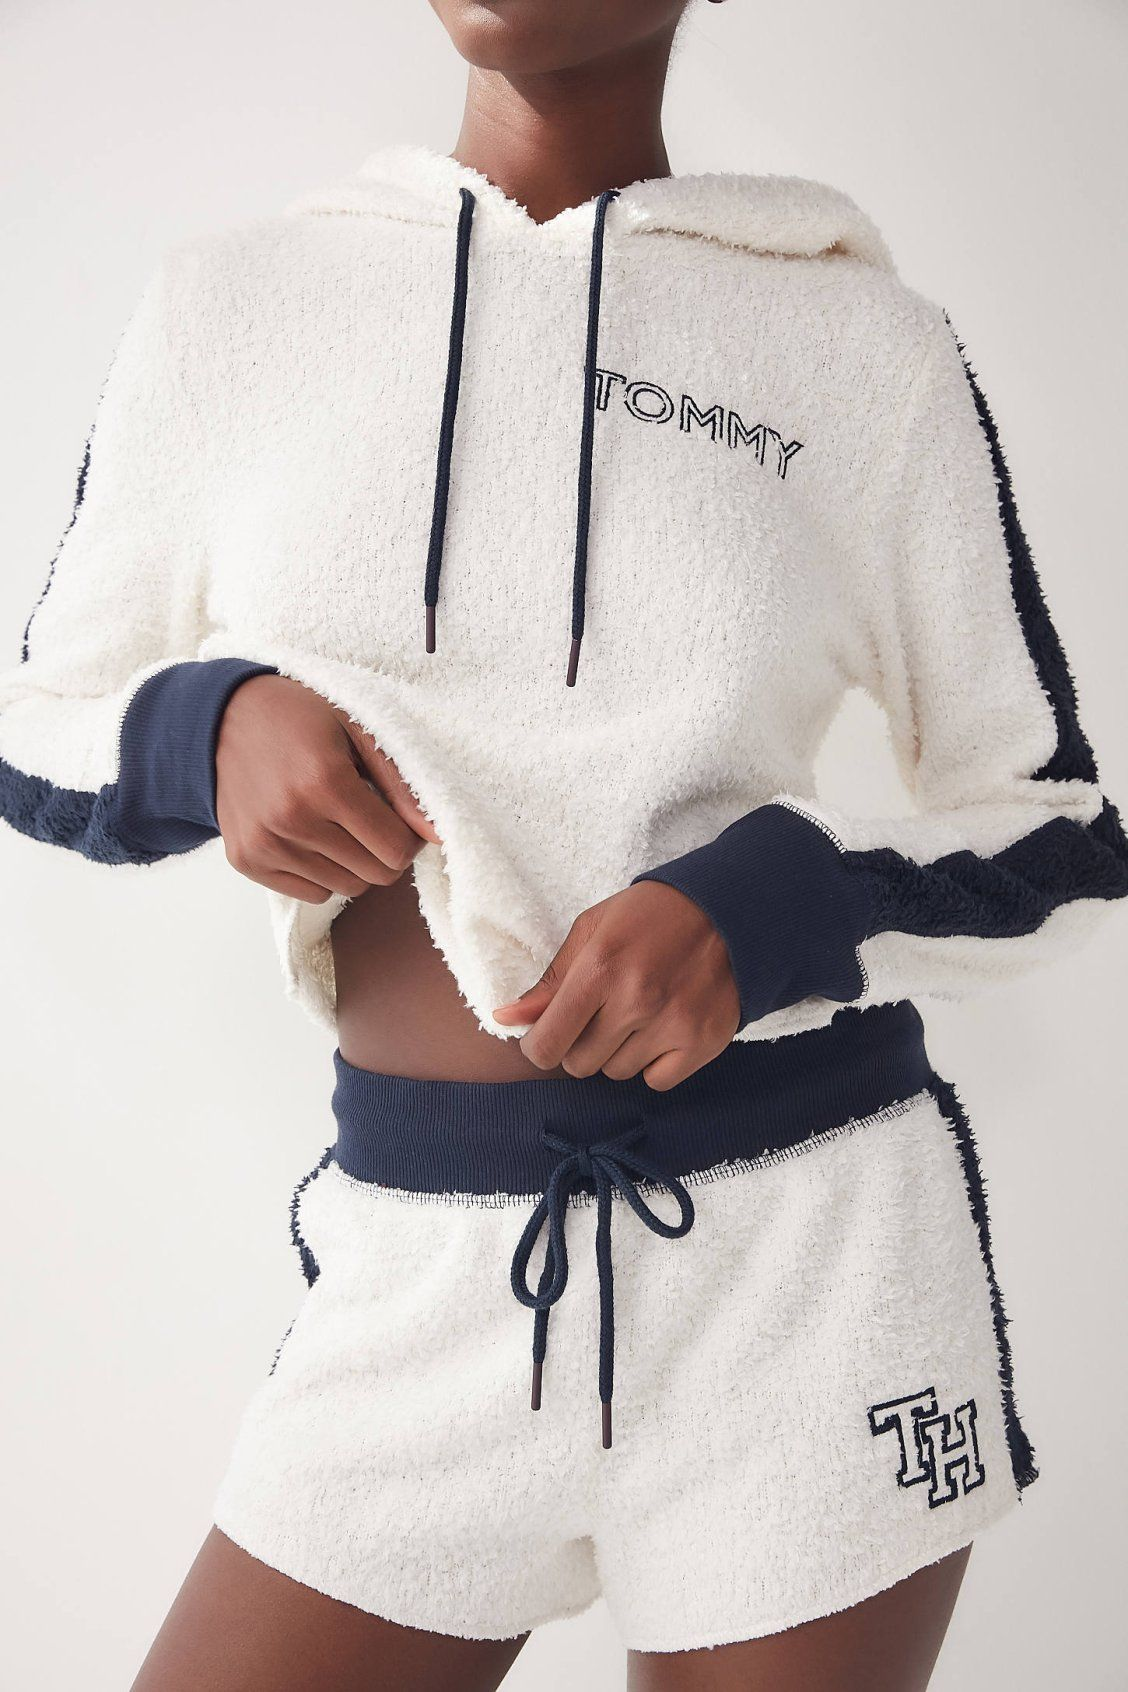 Tommy Hilfiger Marshmallow Short Urban Outfitters Tommy Hilfiger Outfit Sporty Outfits Outfits With Leggings